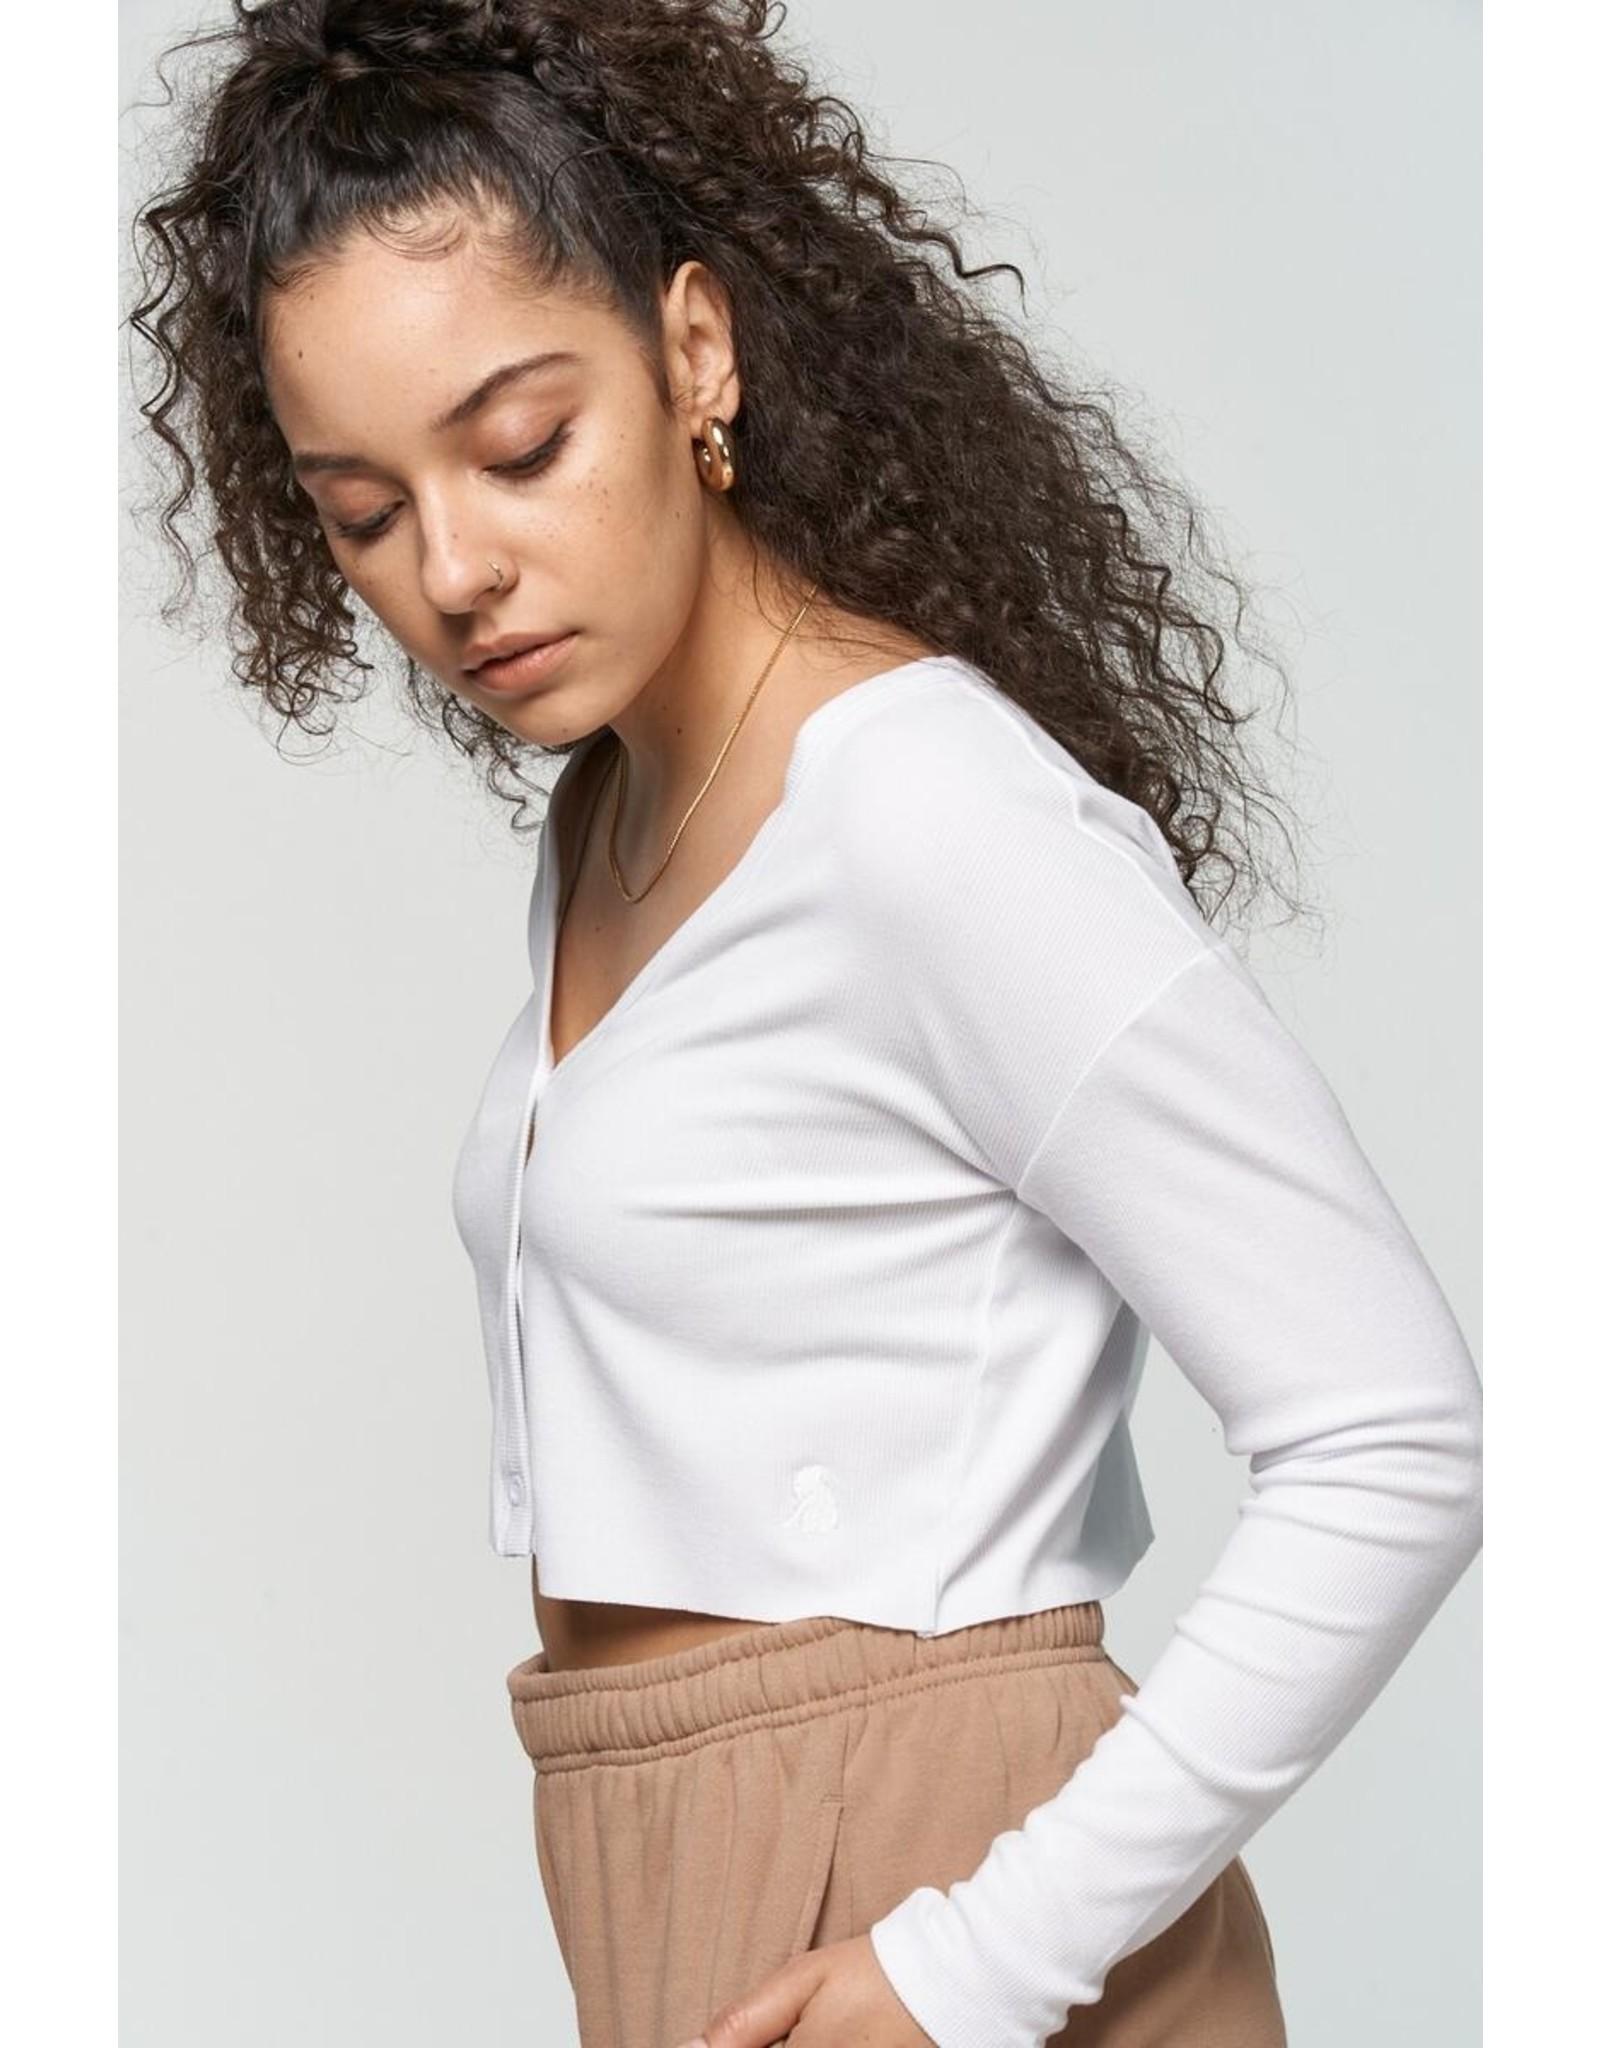 Kuwallatee Mini Cardigan Cropped Long Sleeve